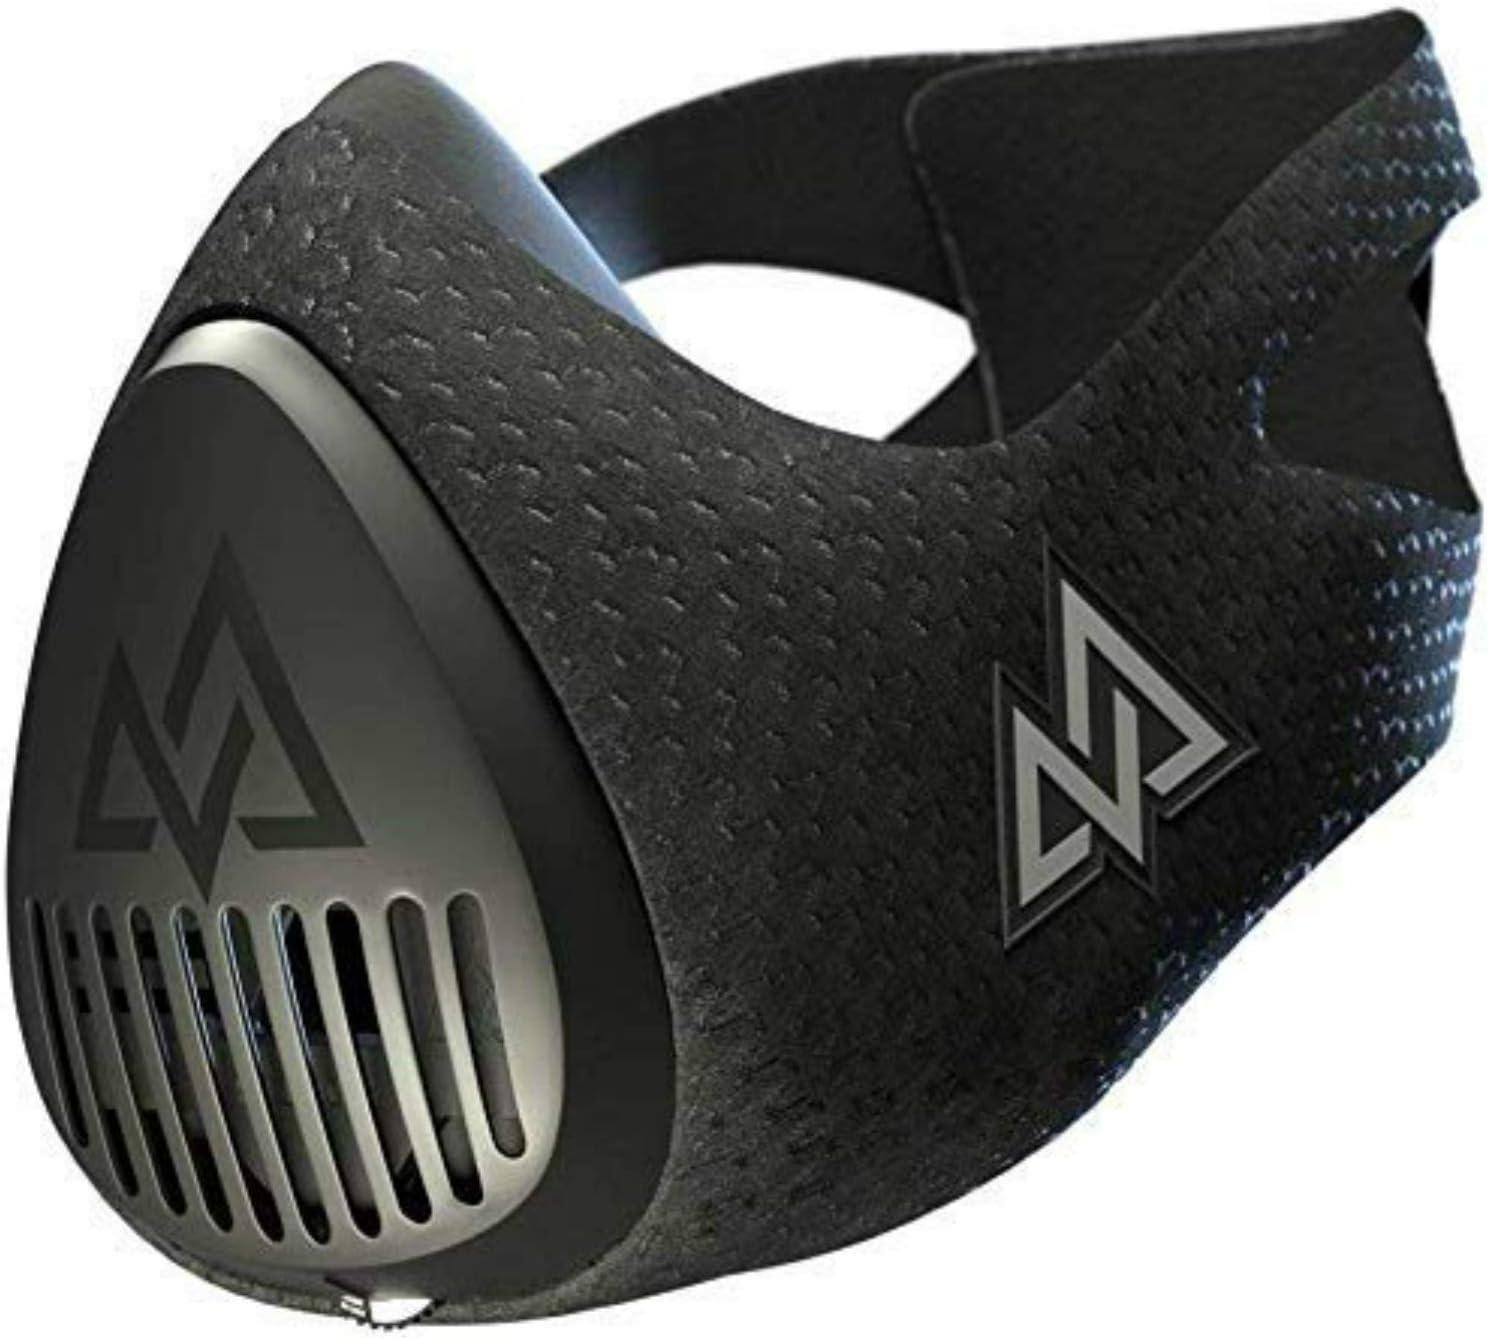 Training mask3.0 トレーニングマスク3.0 エレベーションマスク 低酸素 呼吸筋トレーニング 肺活量【国内保証付き正規品】